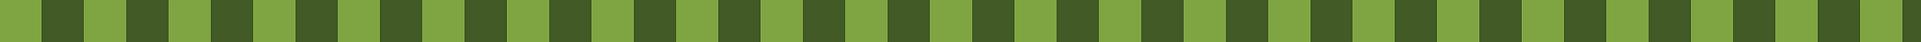 Green abode web bottom strip checker.png